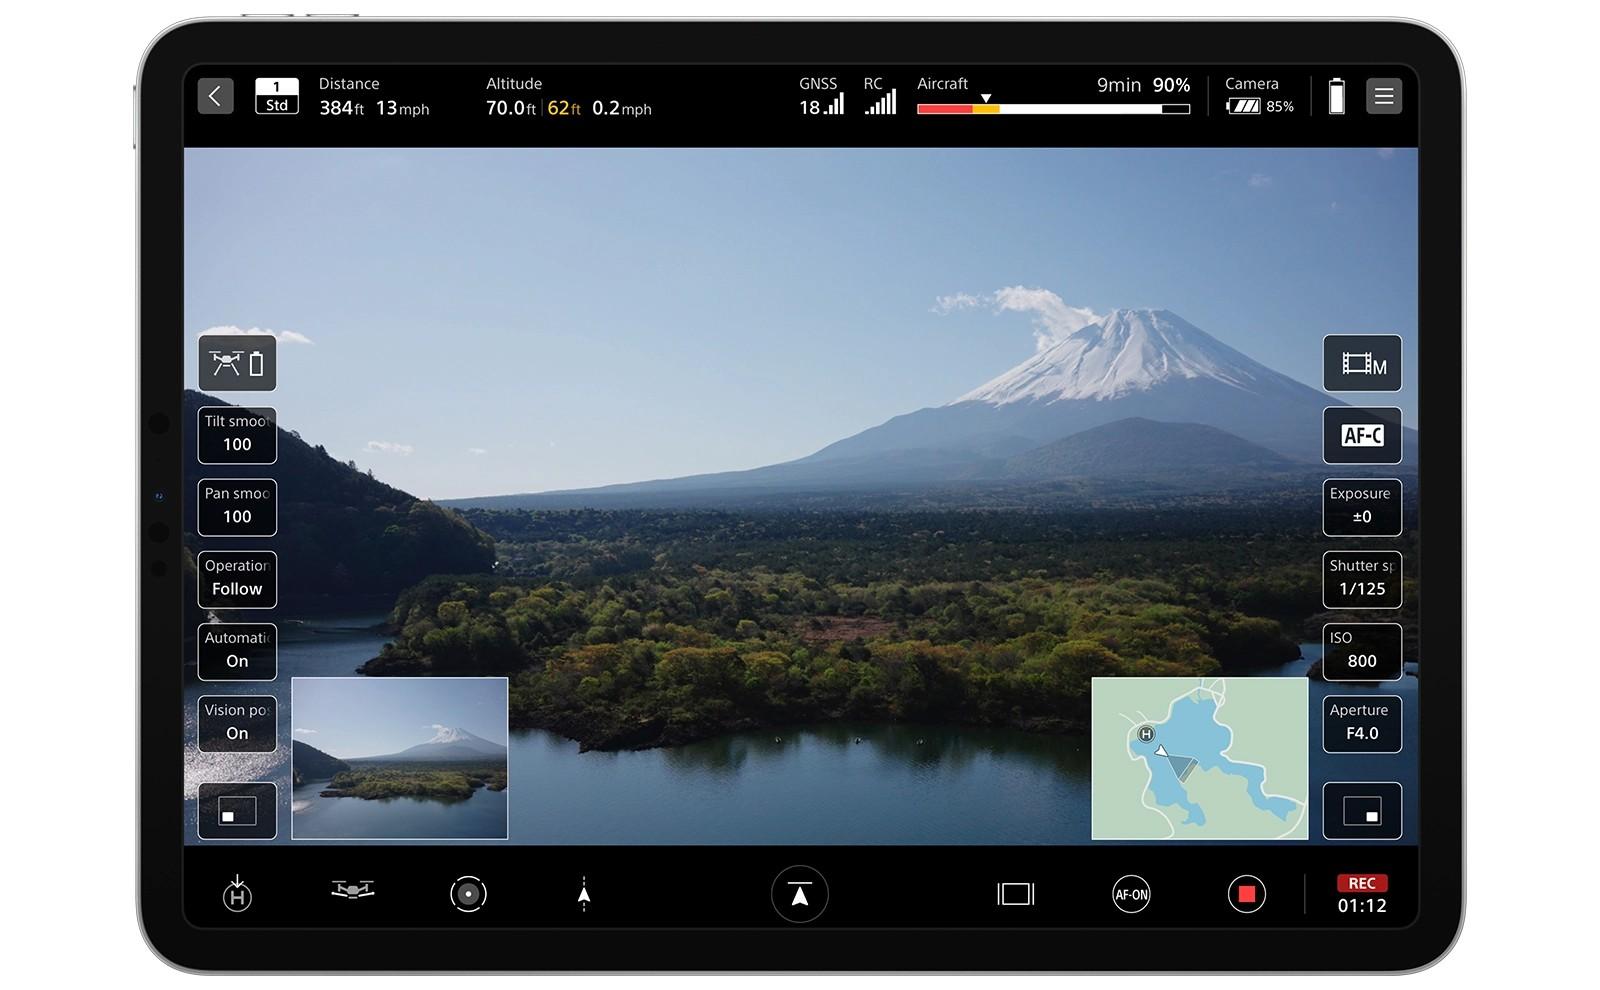 Airpeak S1 iPad Flight App (1)